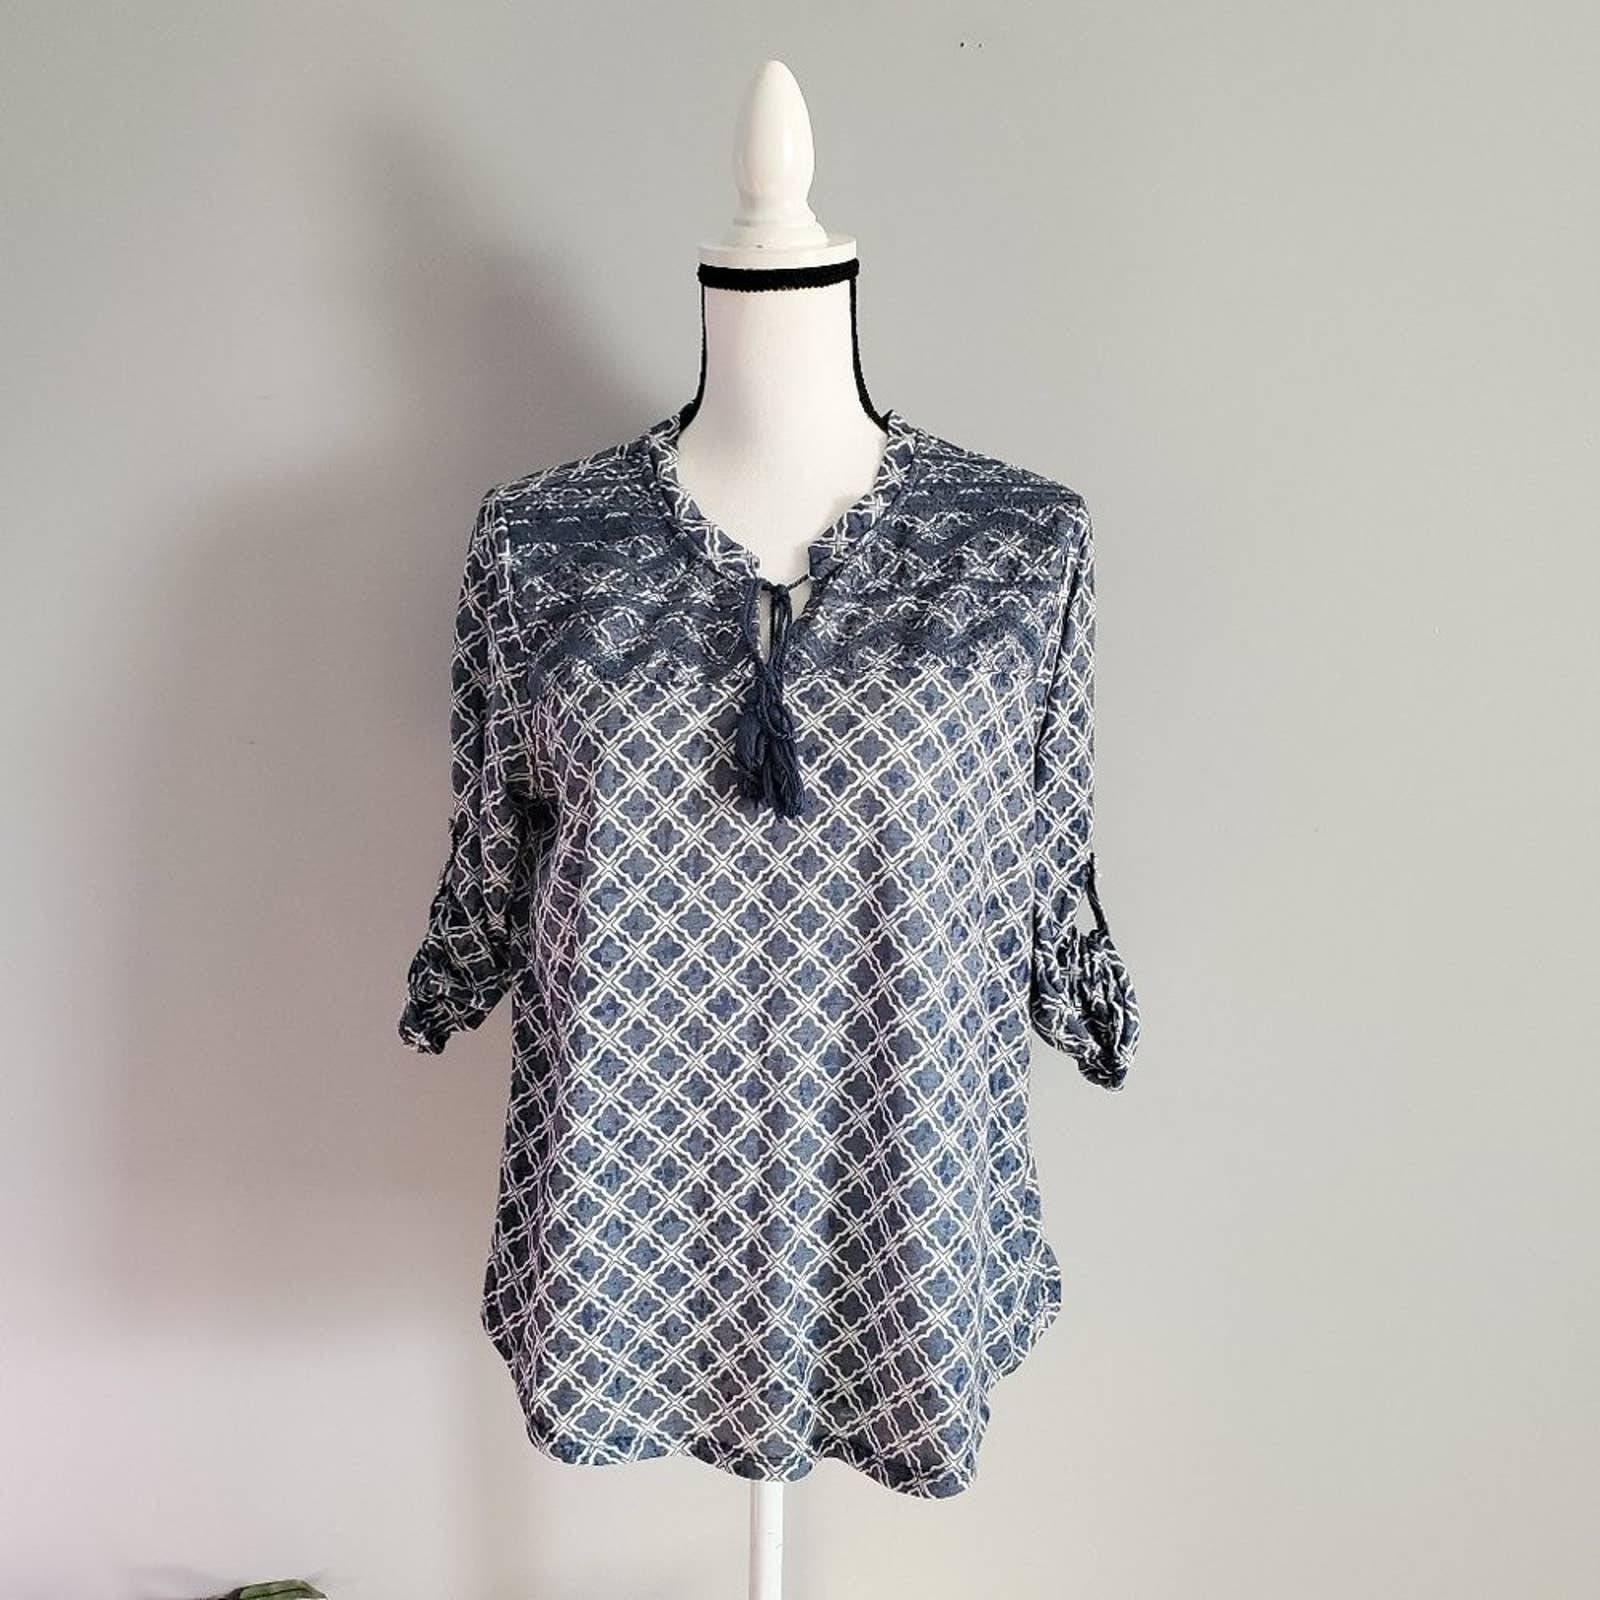 Max Jeans 3/4 Sleeve Boho Shirt Top L